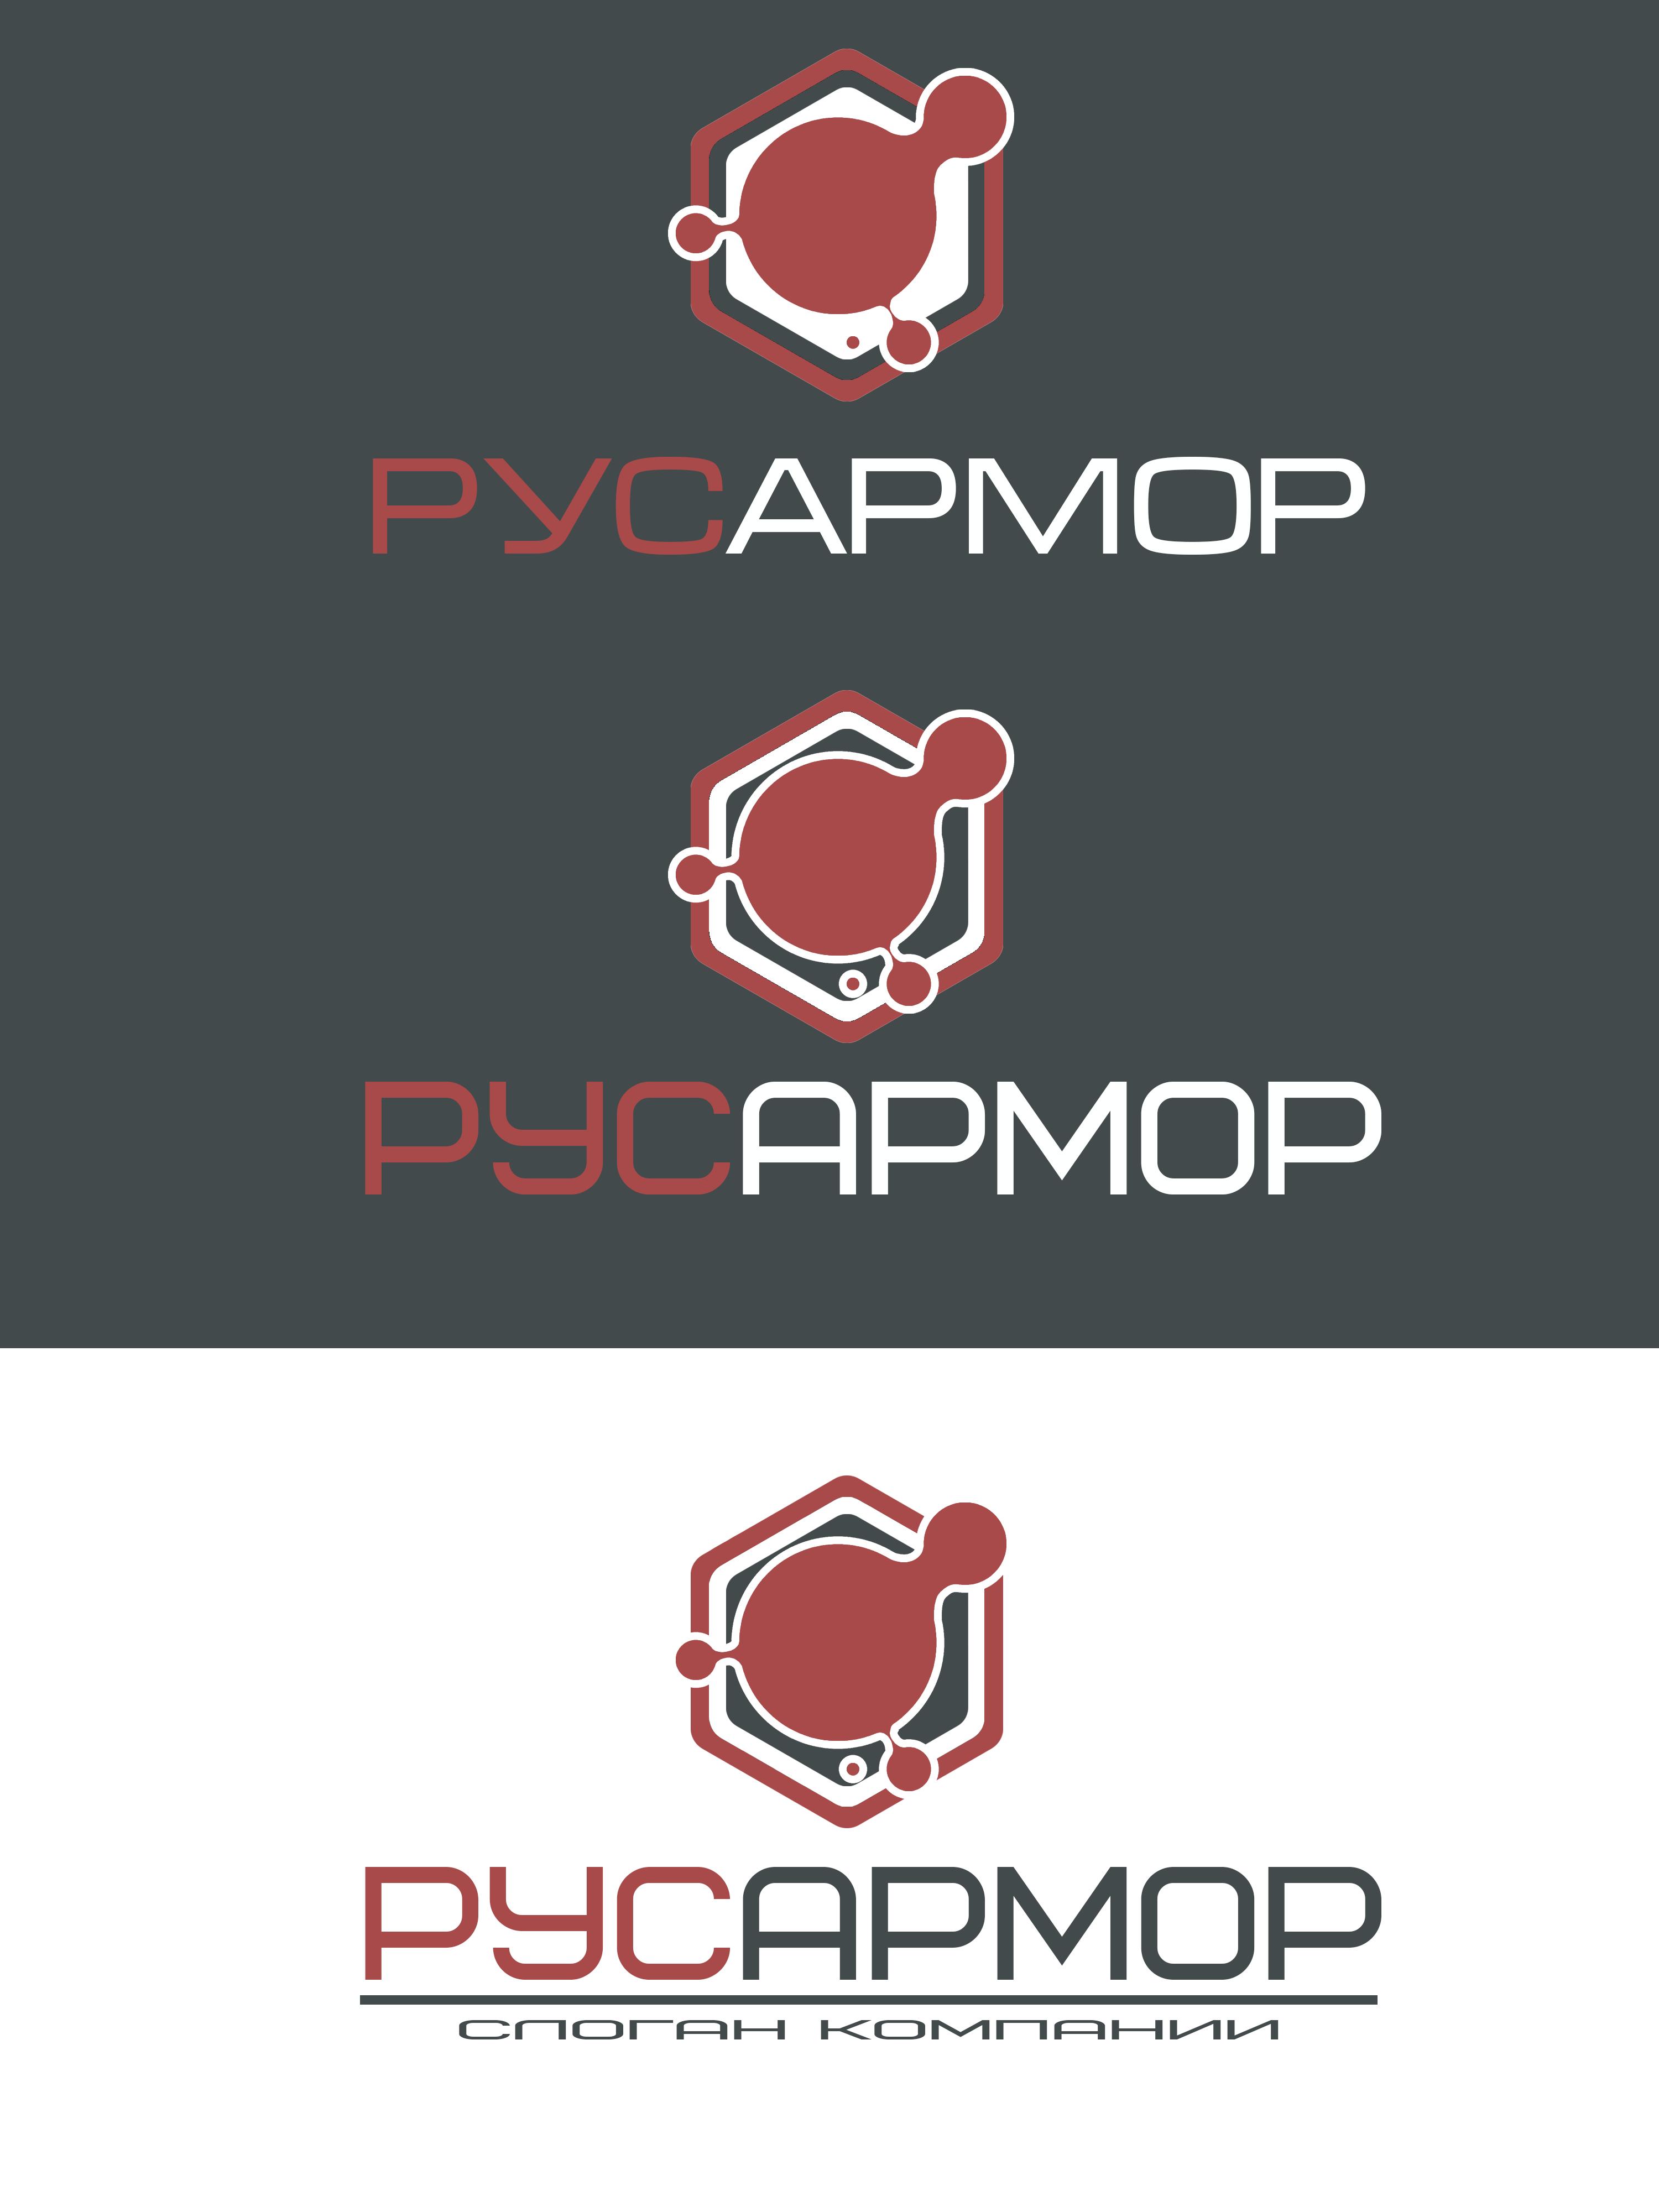 Разработка логотипа технологического стартапа РУСАРМОР фото f_8265a0eb82400437.png